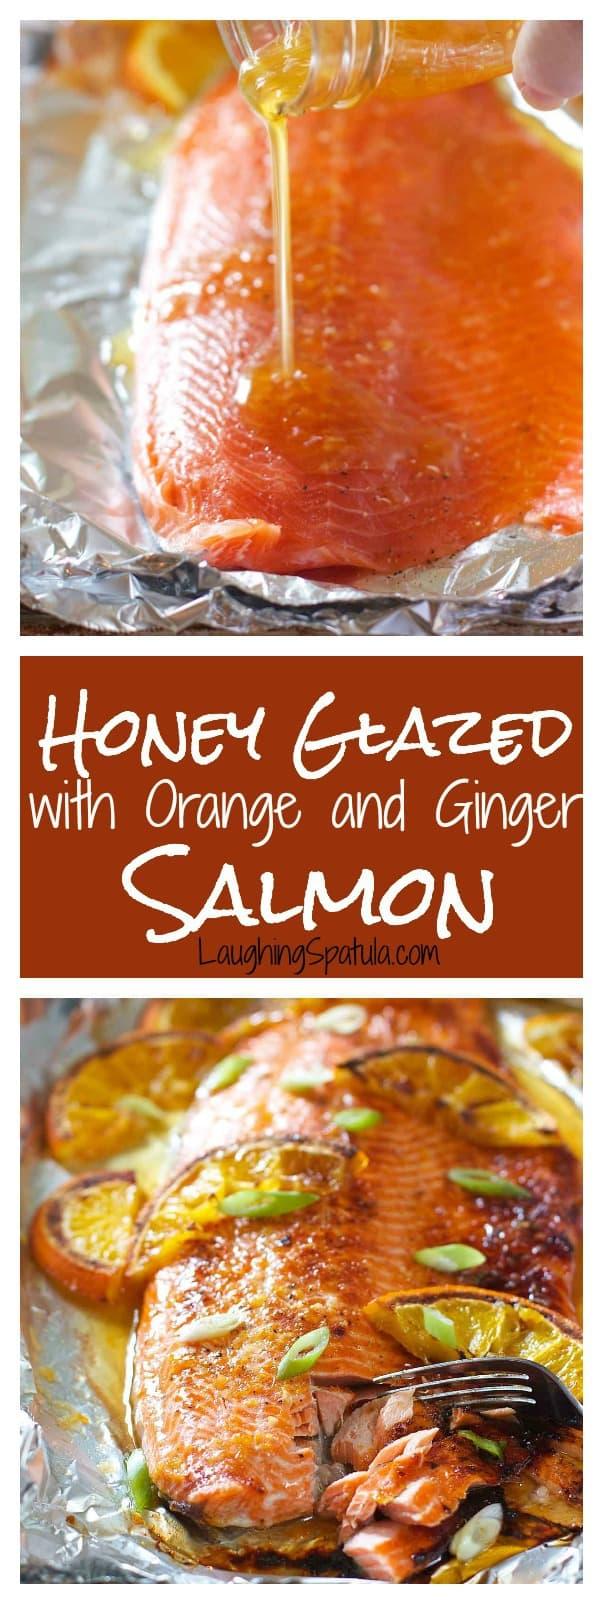 Honey Glazed Salmon With Orange And Ginger Laughing Spatula